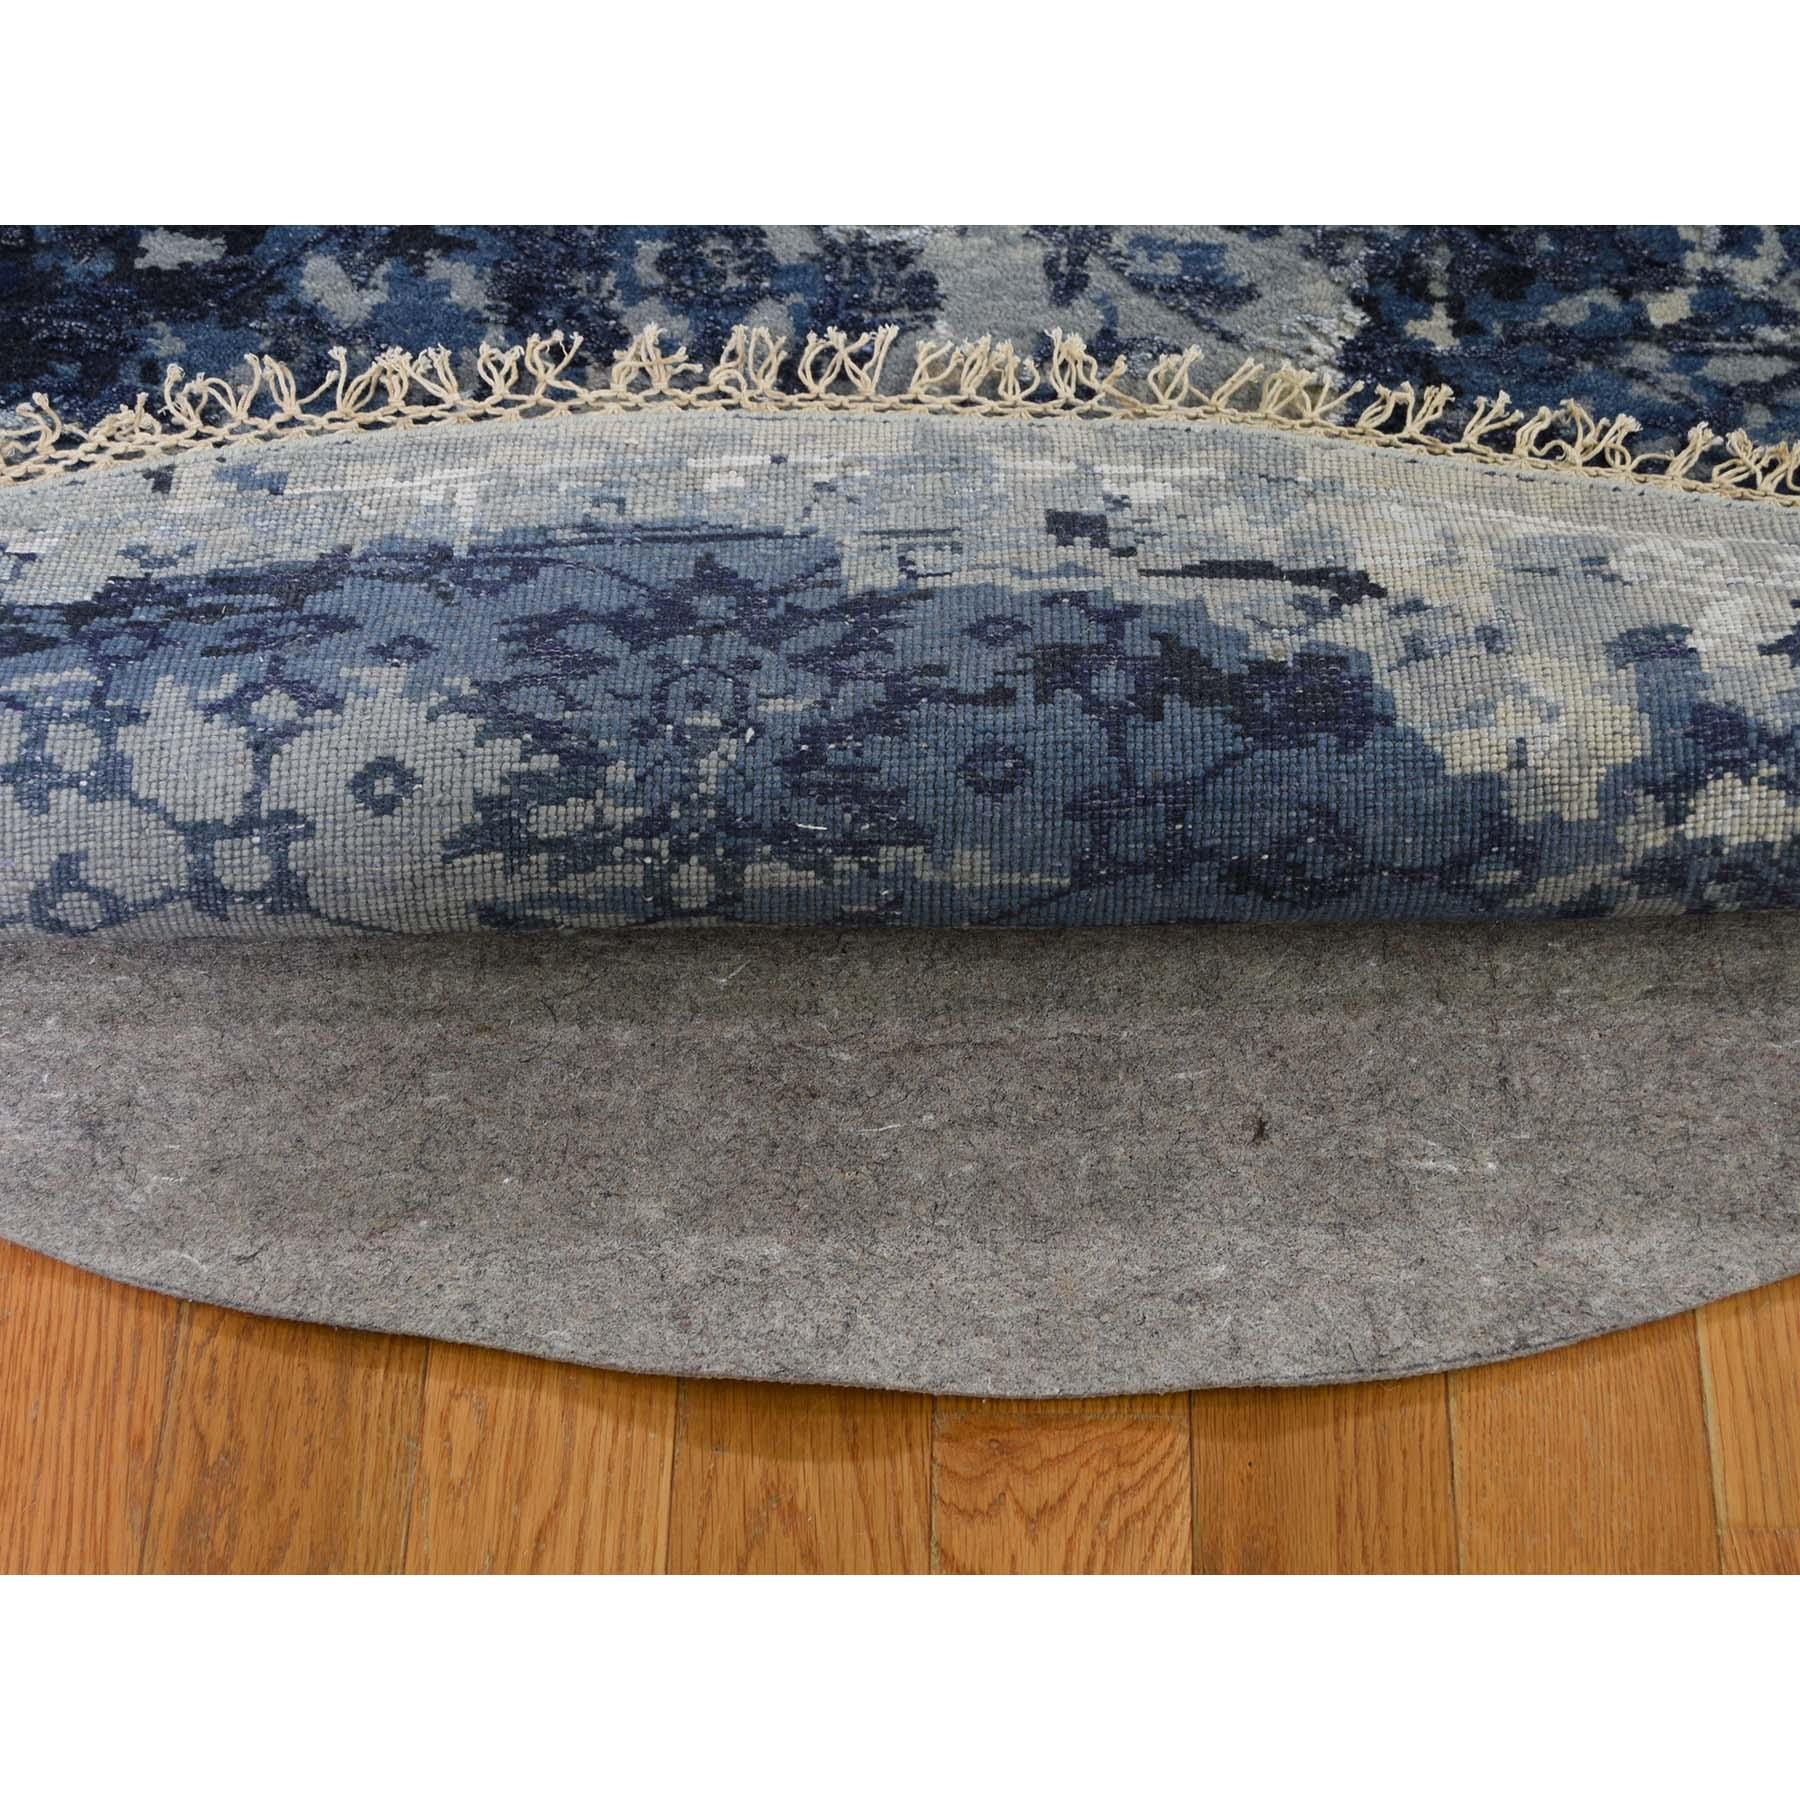 7-10 x7-10  Round Wool And Silk Shibori Design Tone On Tone Hand-Knotted Oriental Rug